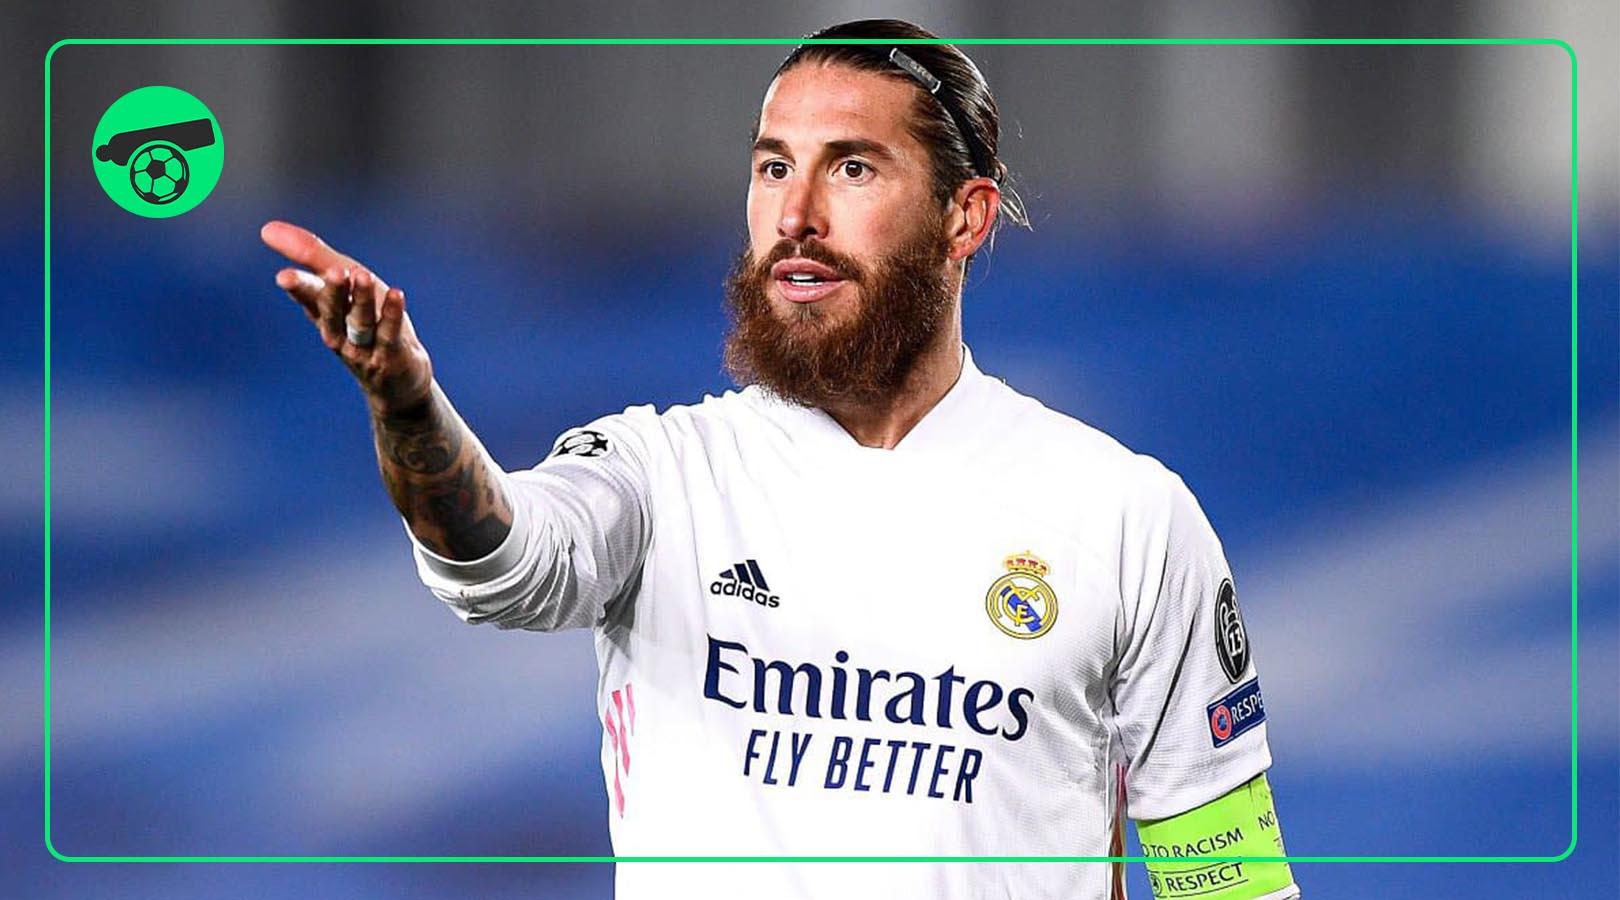 Sergio Ramos, 35, is leaving Real Madrid